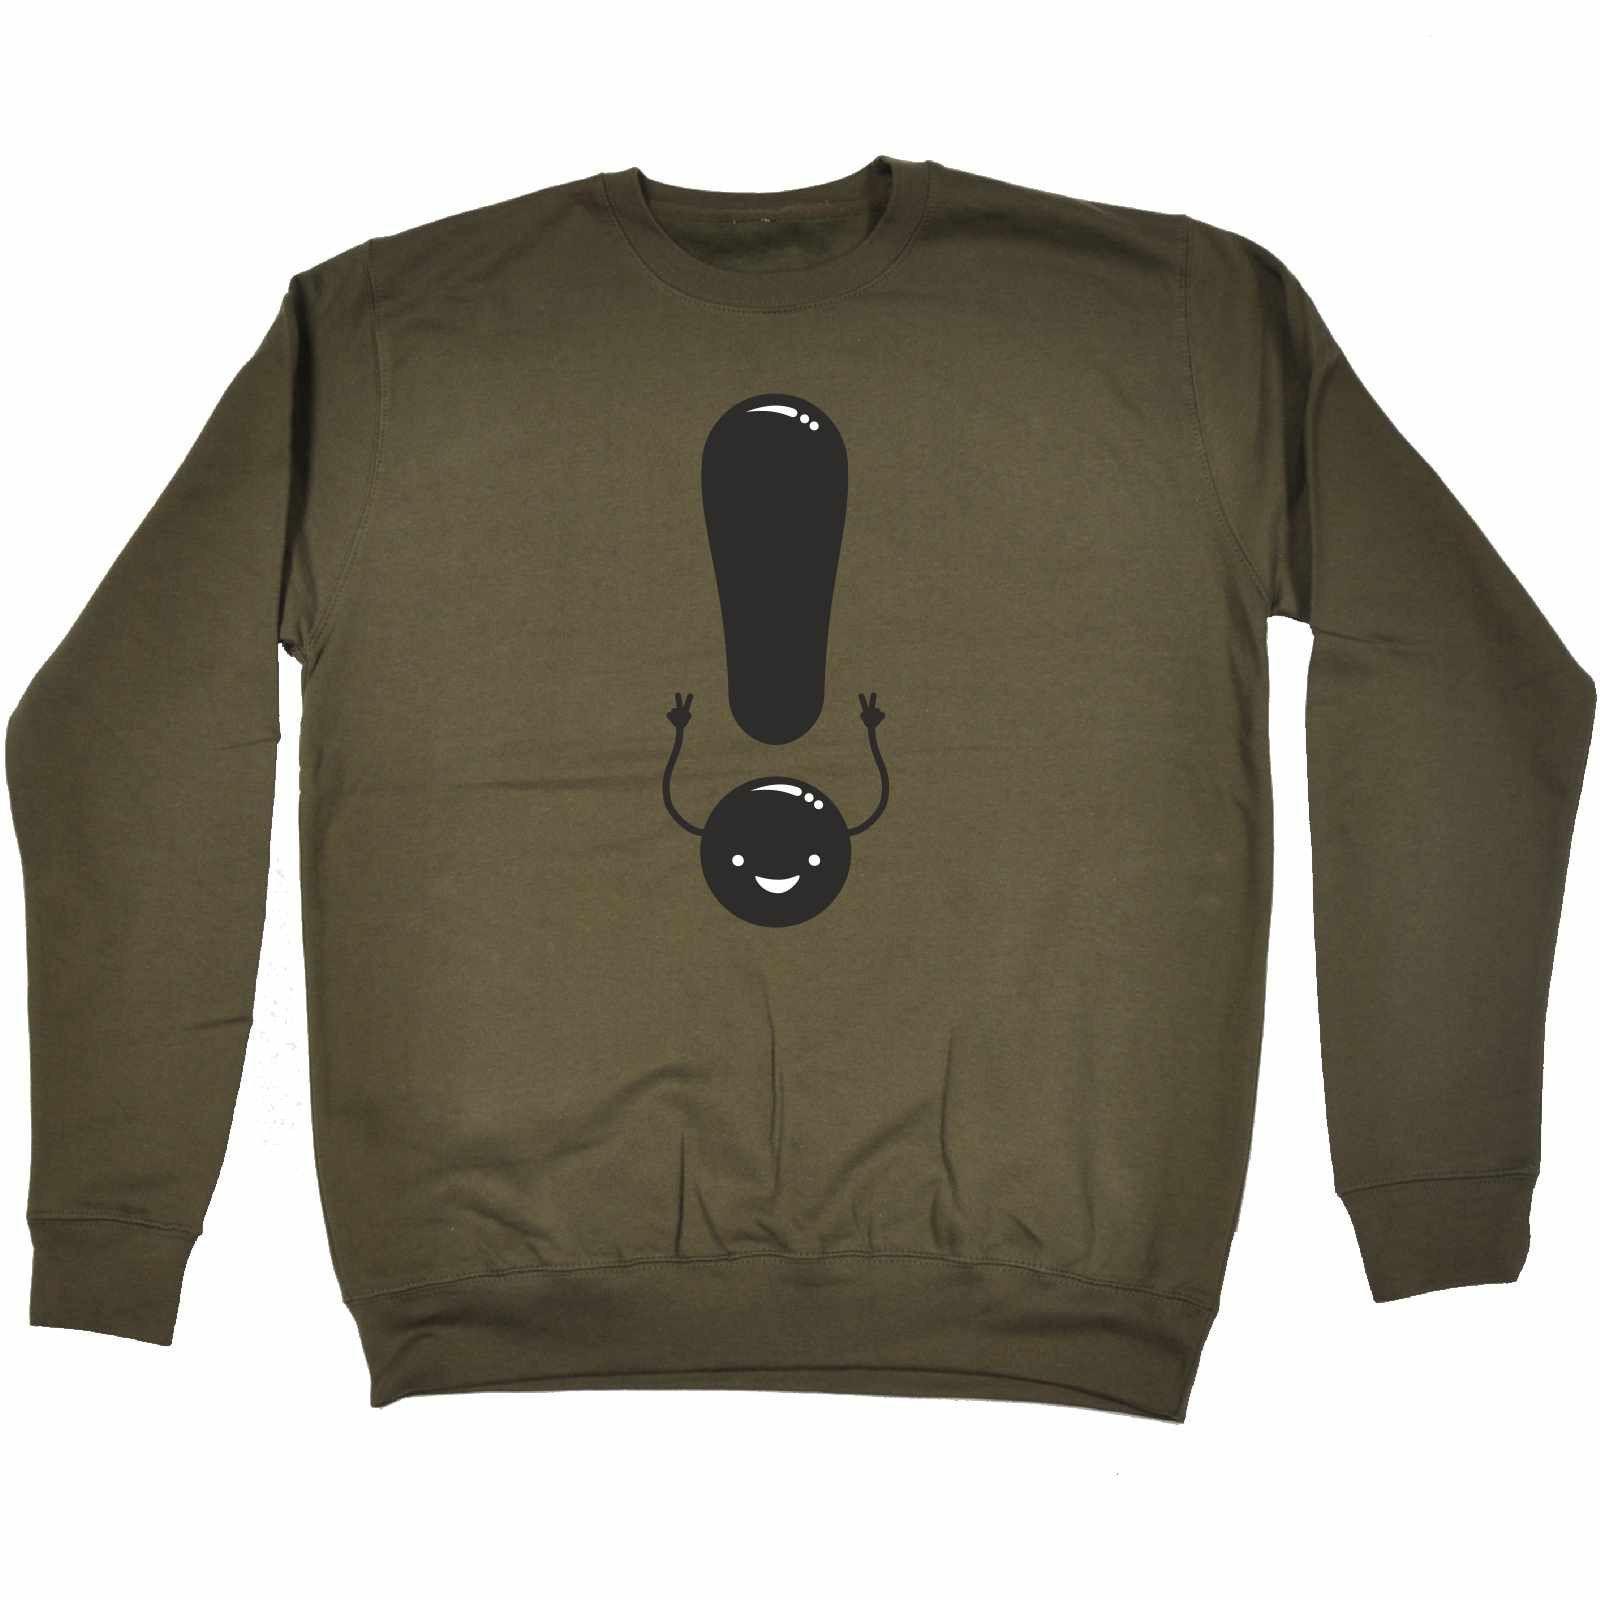 123t USA Exclamation Mark Smiley Peace Design Funny Sweatshirt